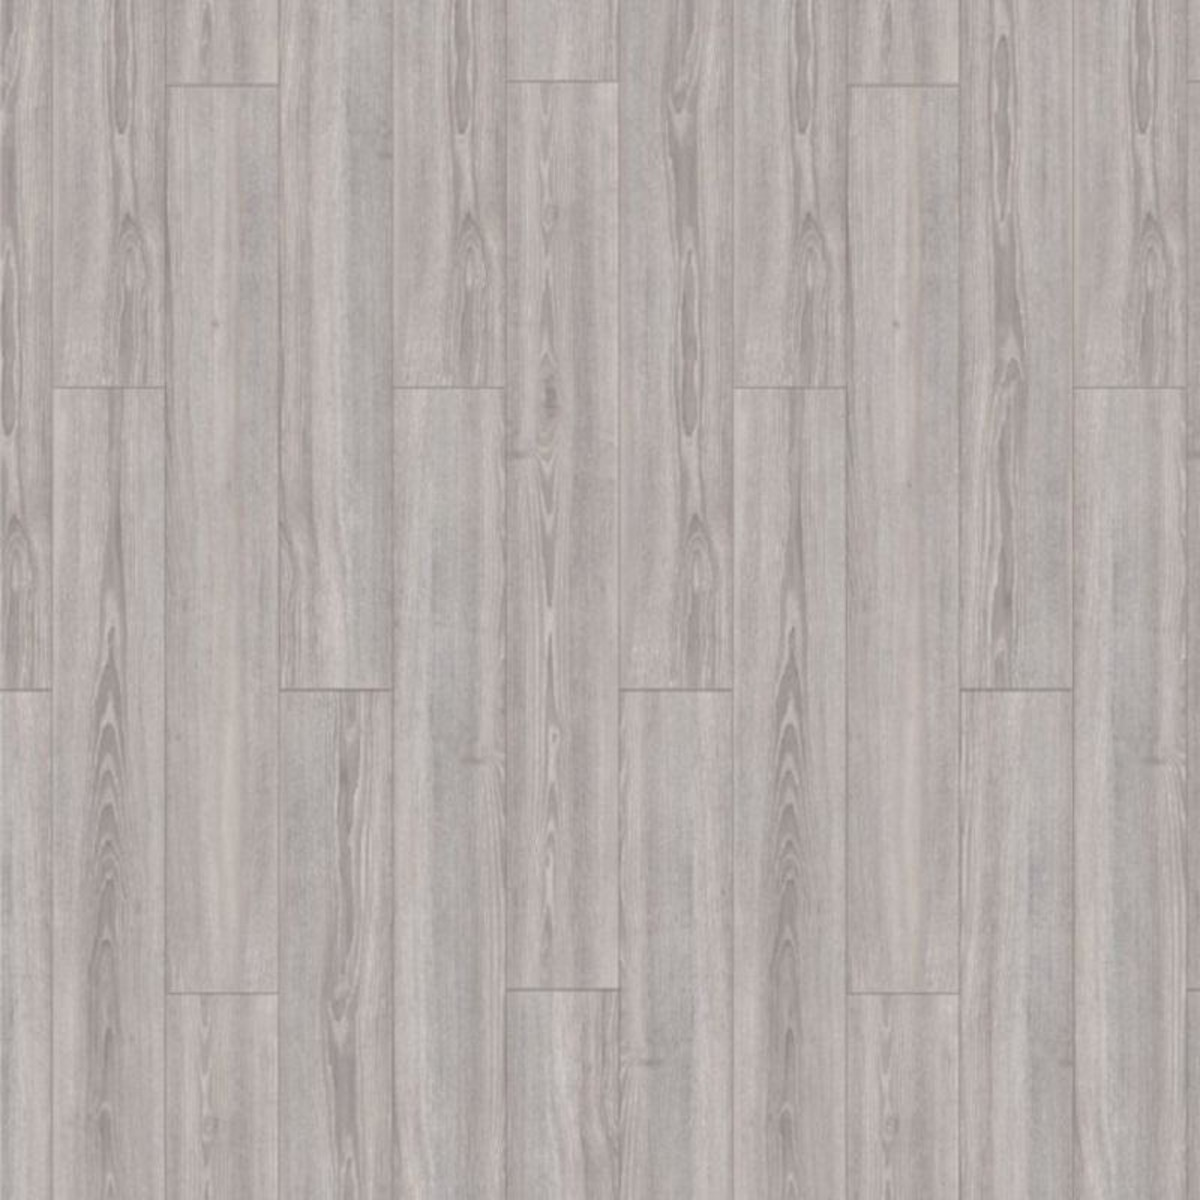 Ламинат Timber Forester 33 класс толщина 10 мм 1.232 м²